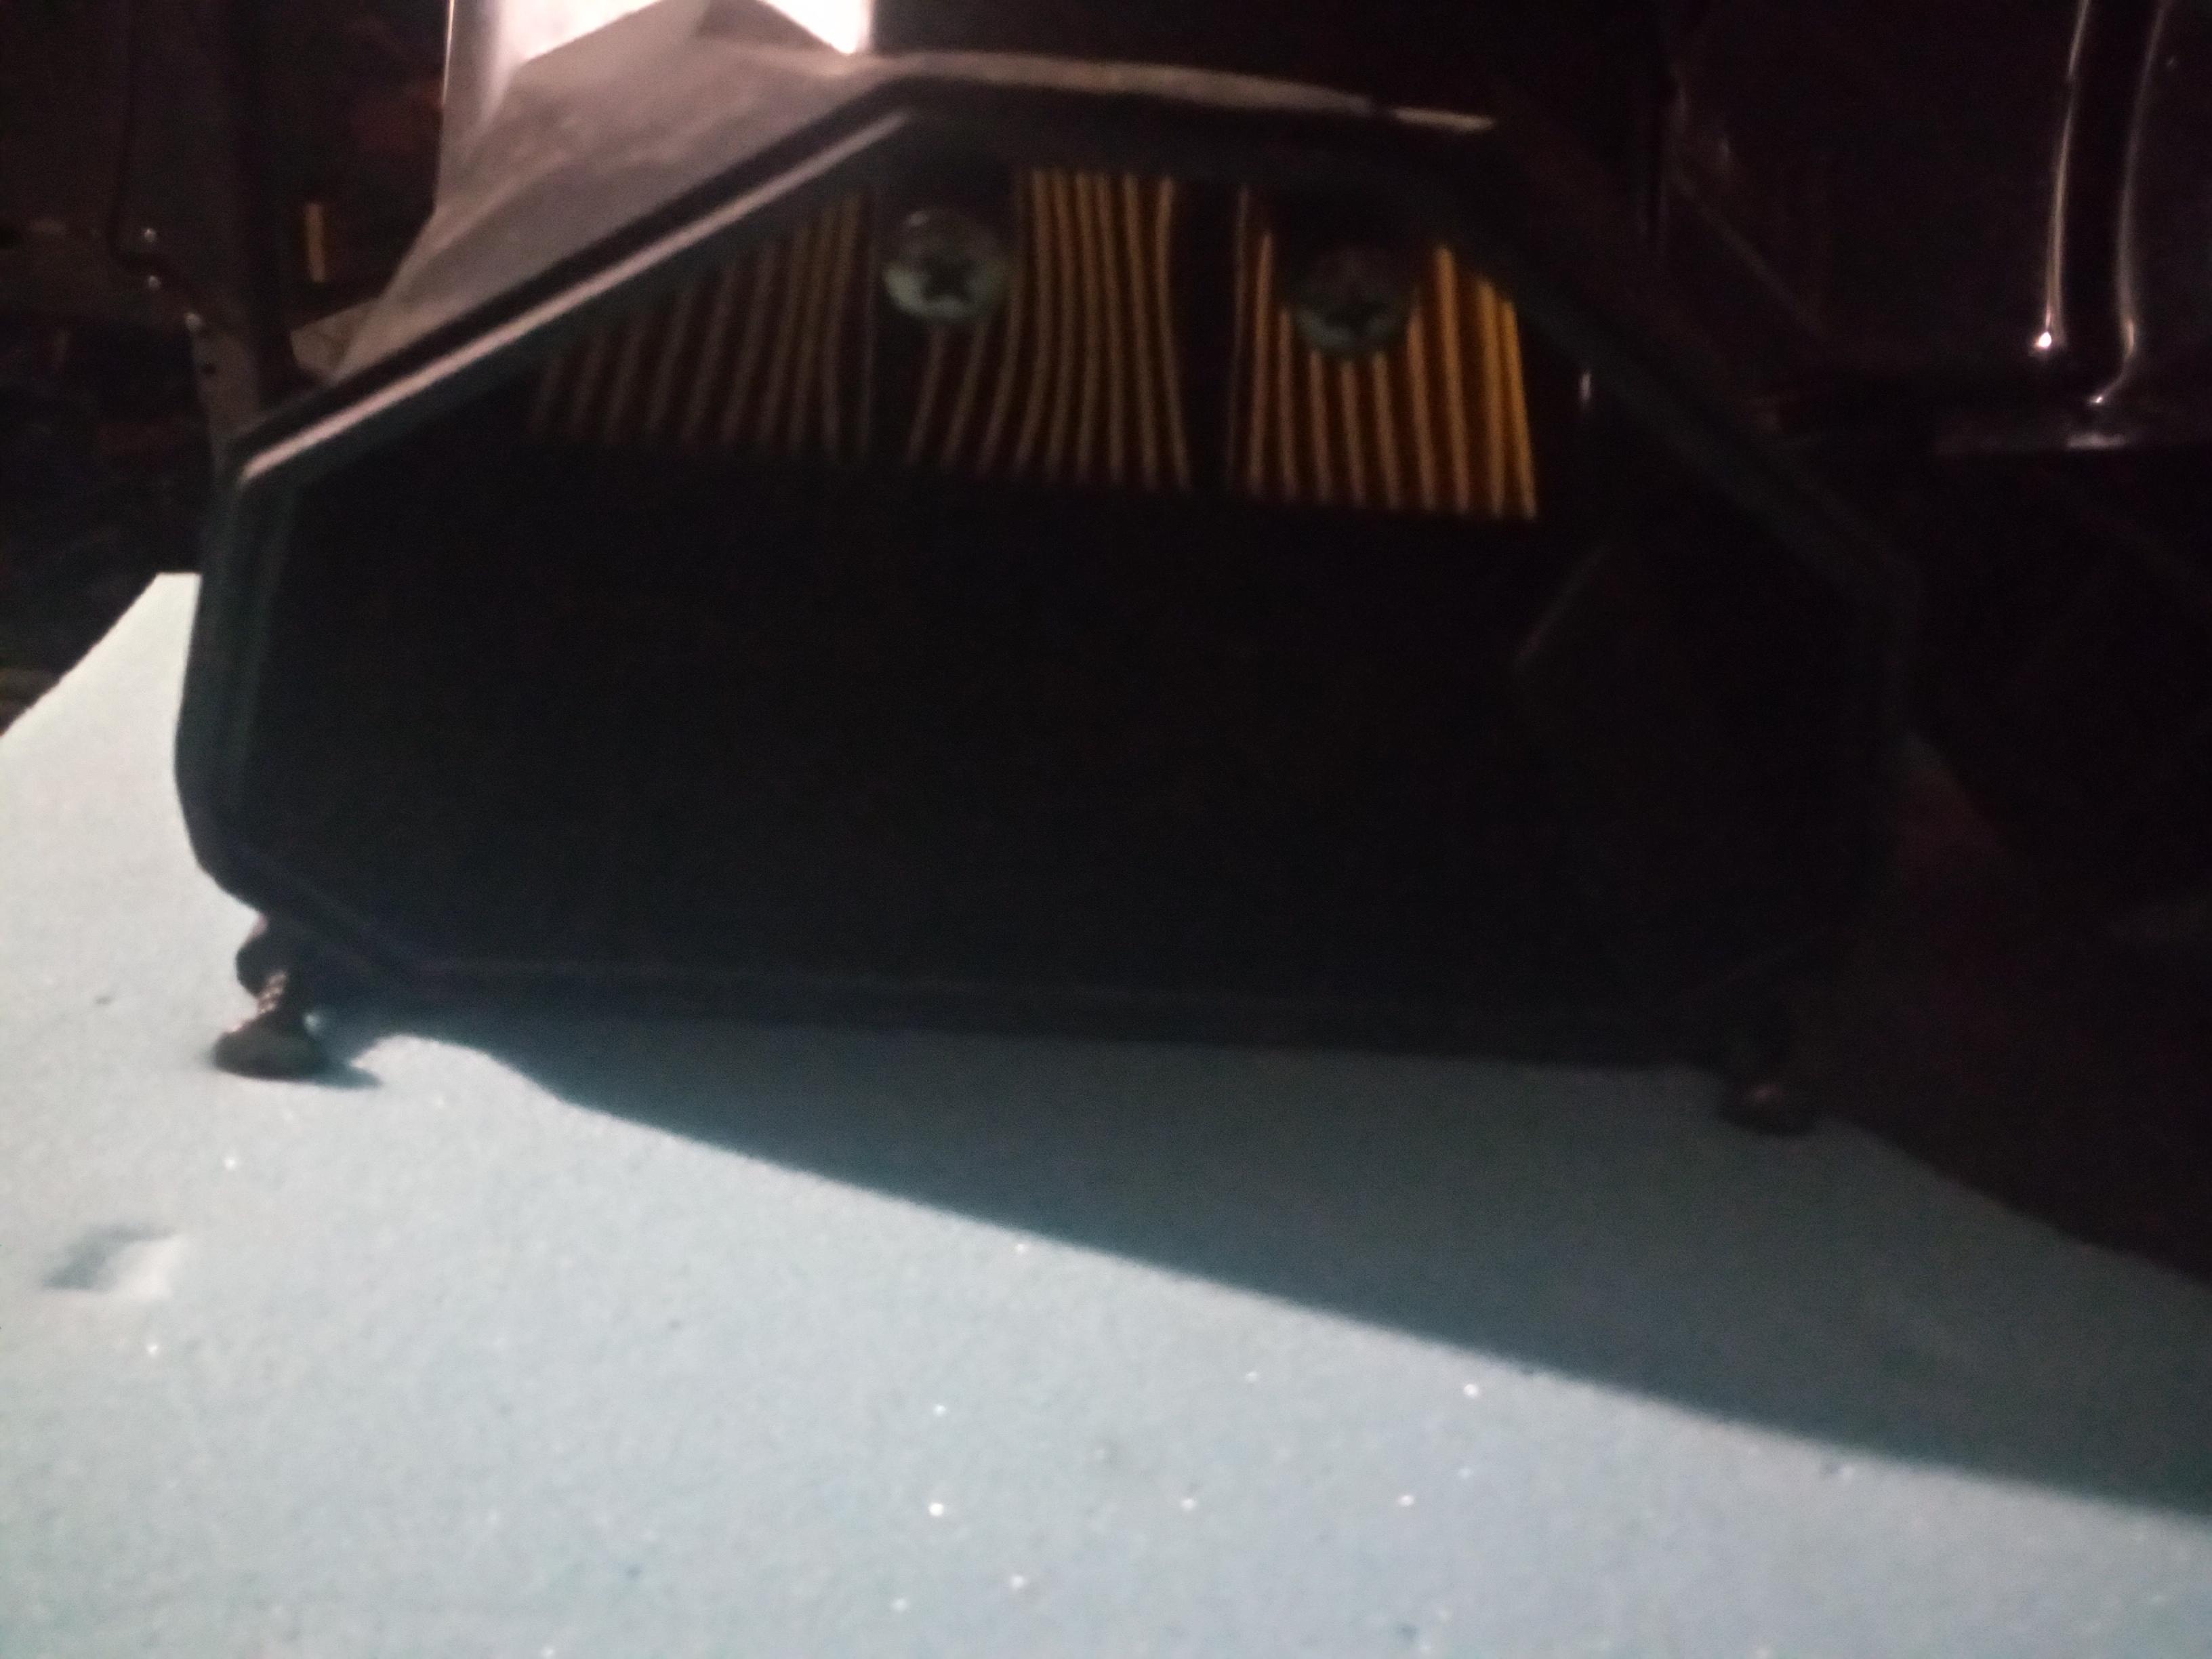 Chinelli 500 modded stuff-img_20200928_200227_6_1601319823112.jpg